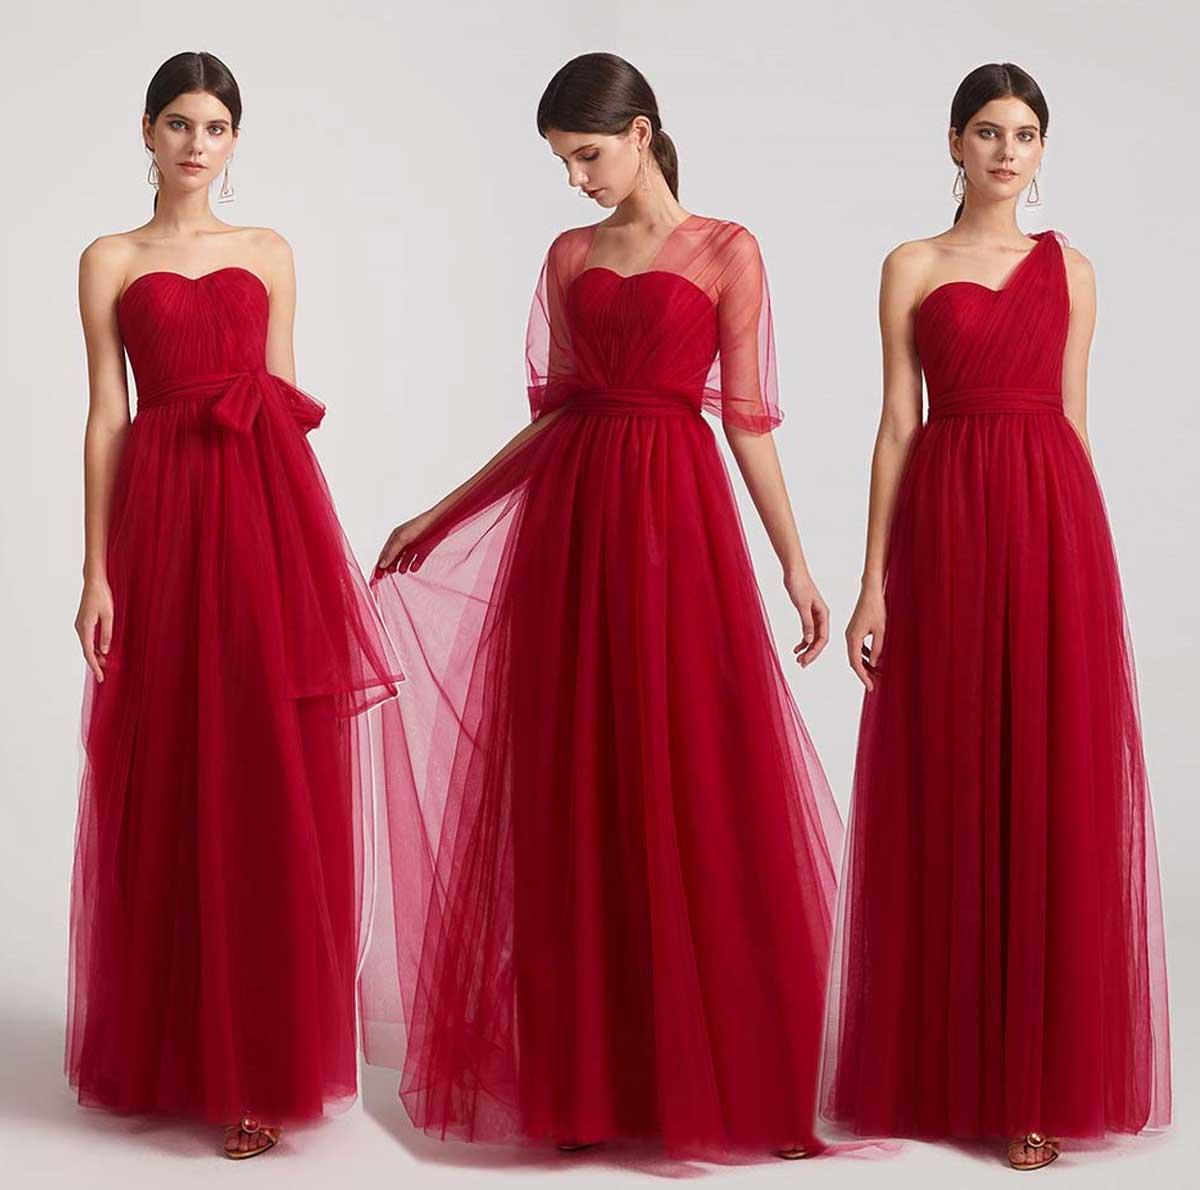 Choose Convertible Bridesmaid Dresses